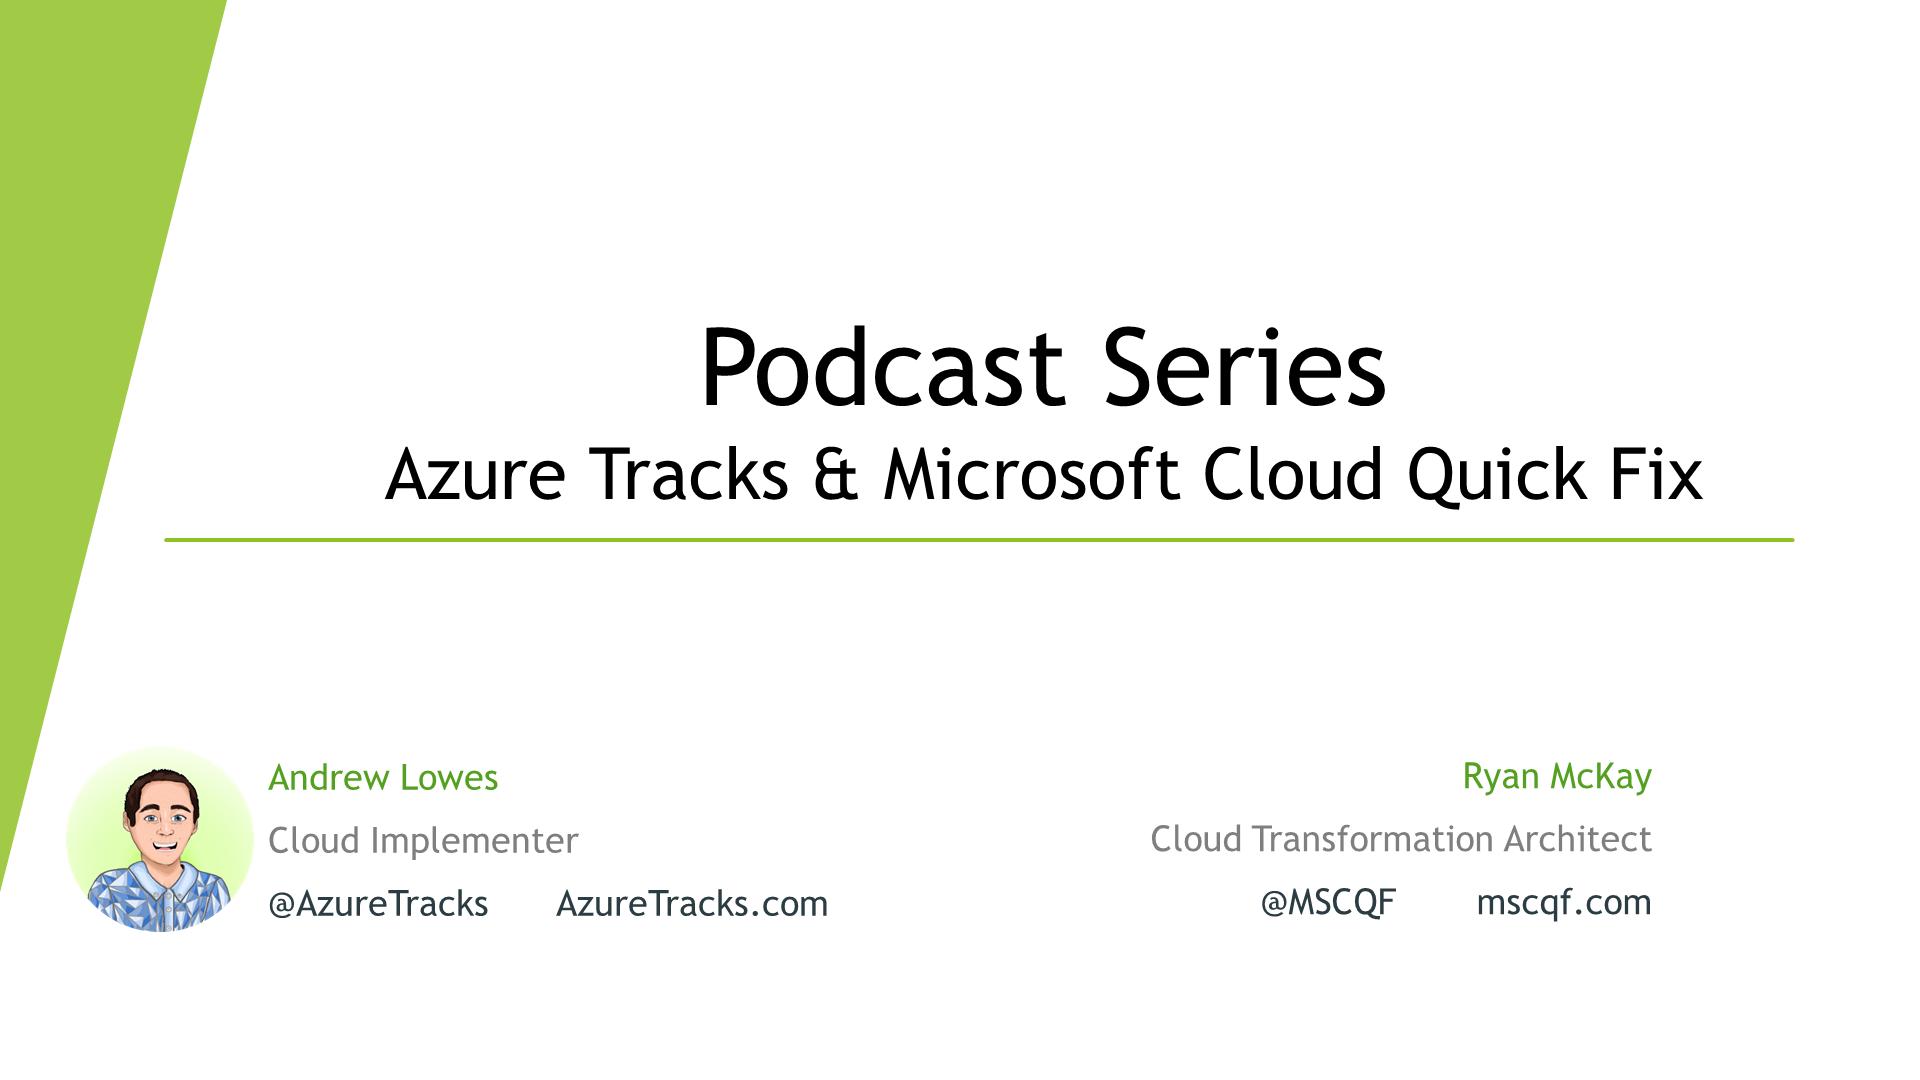 AzureTracks and MSCQF Podcast